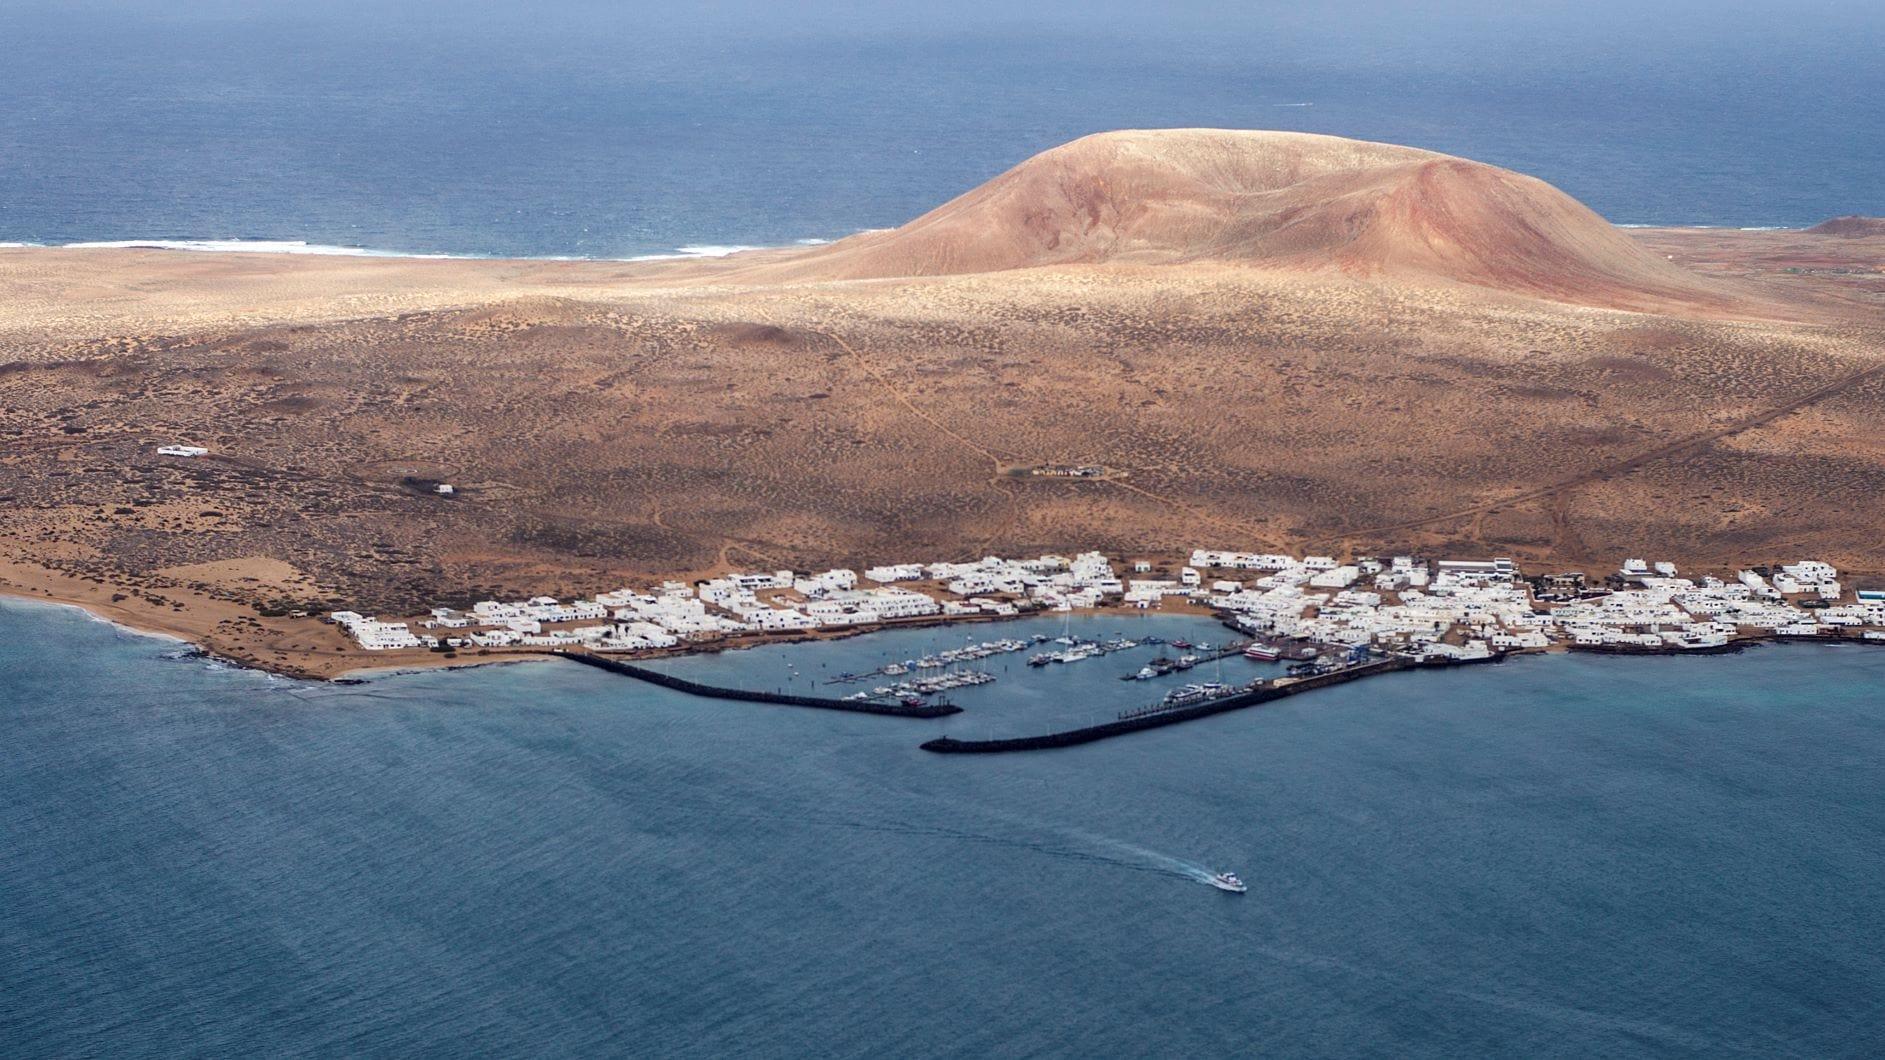 Fischerdorf Puerto de La Graciosa aus der Vogelperspektive